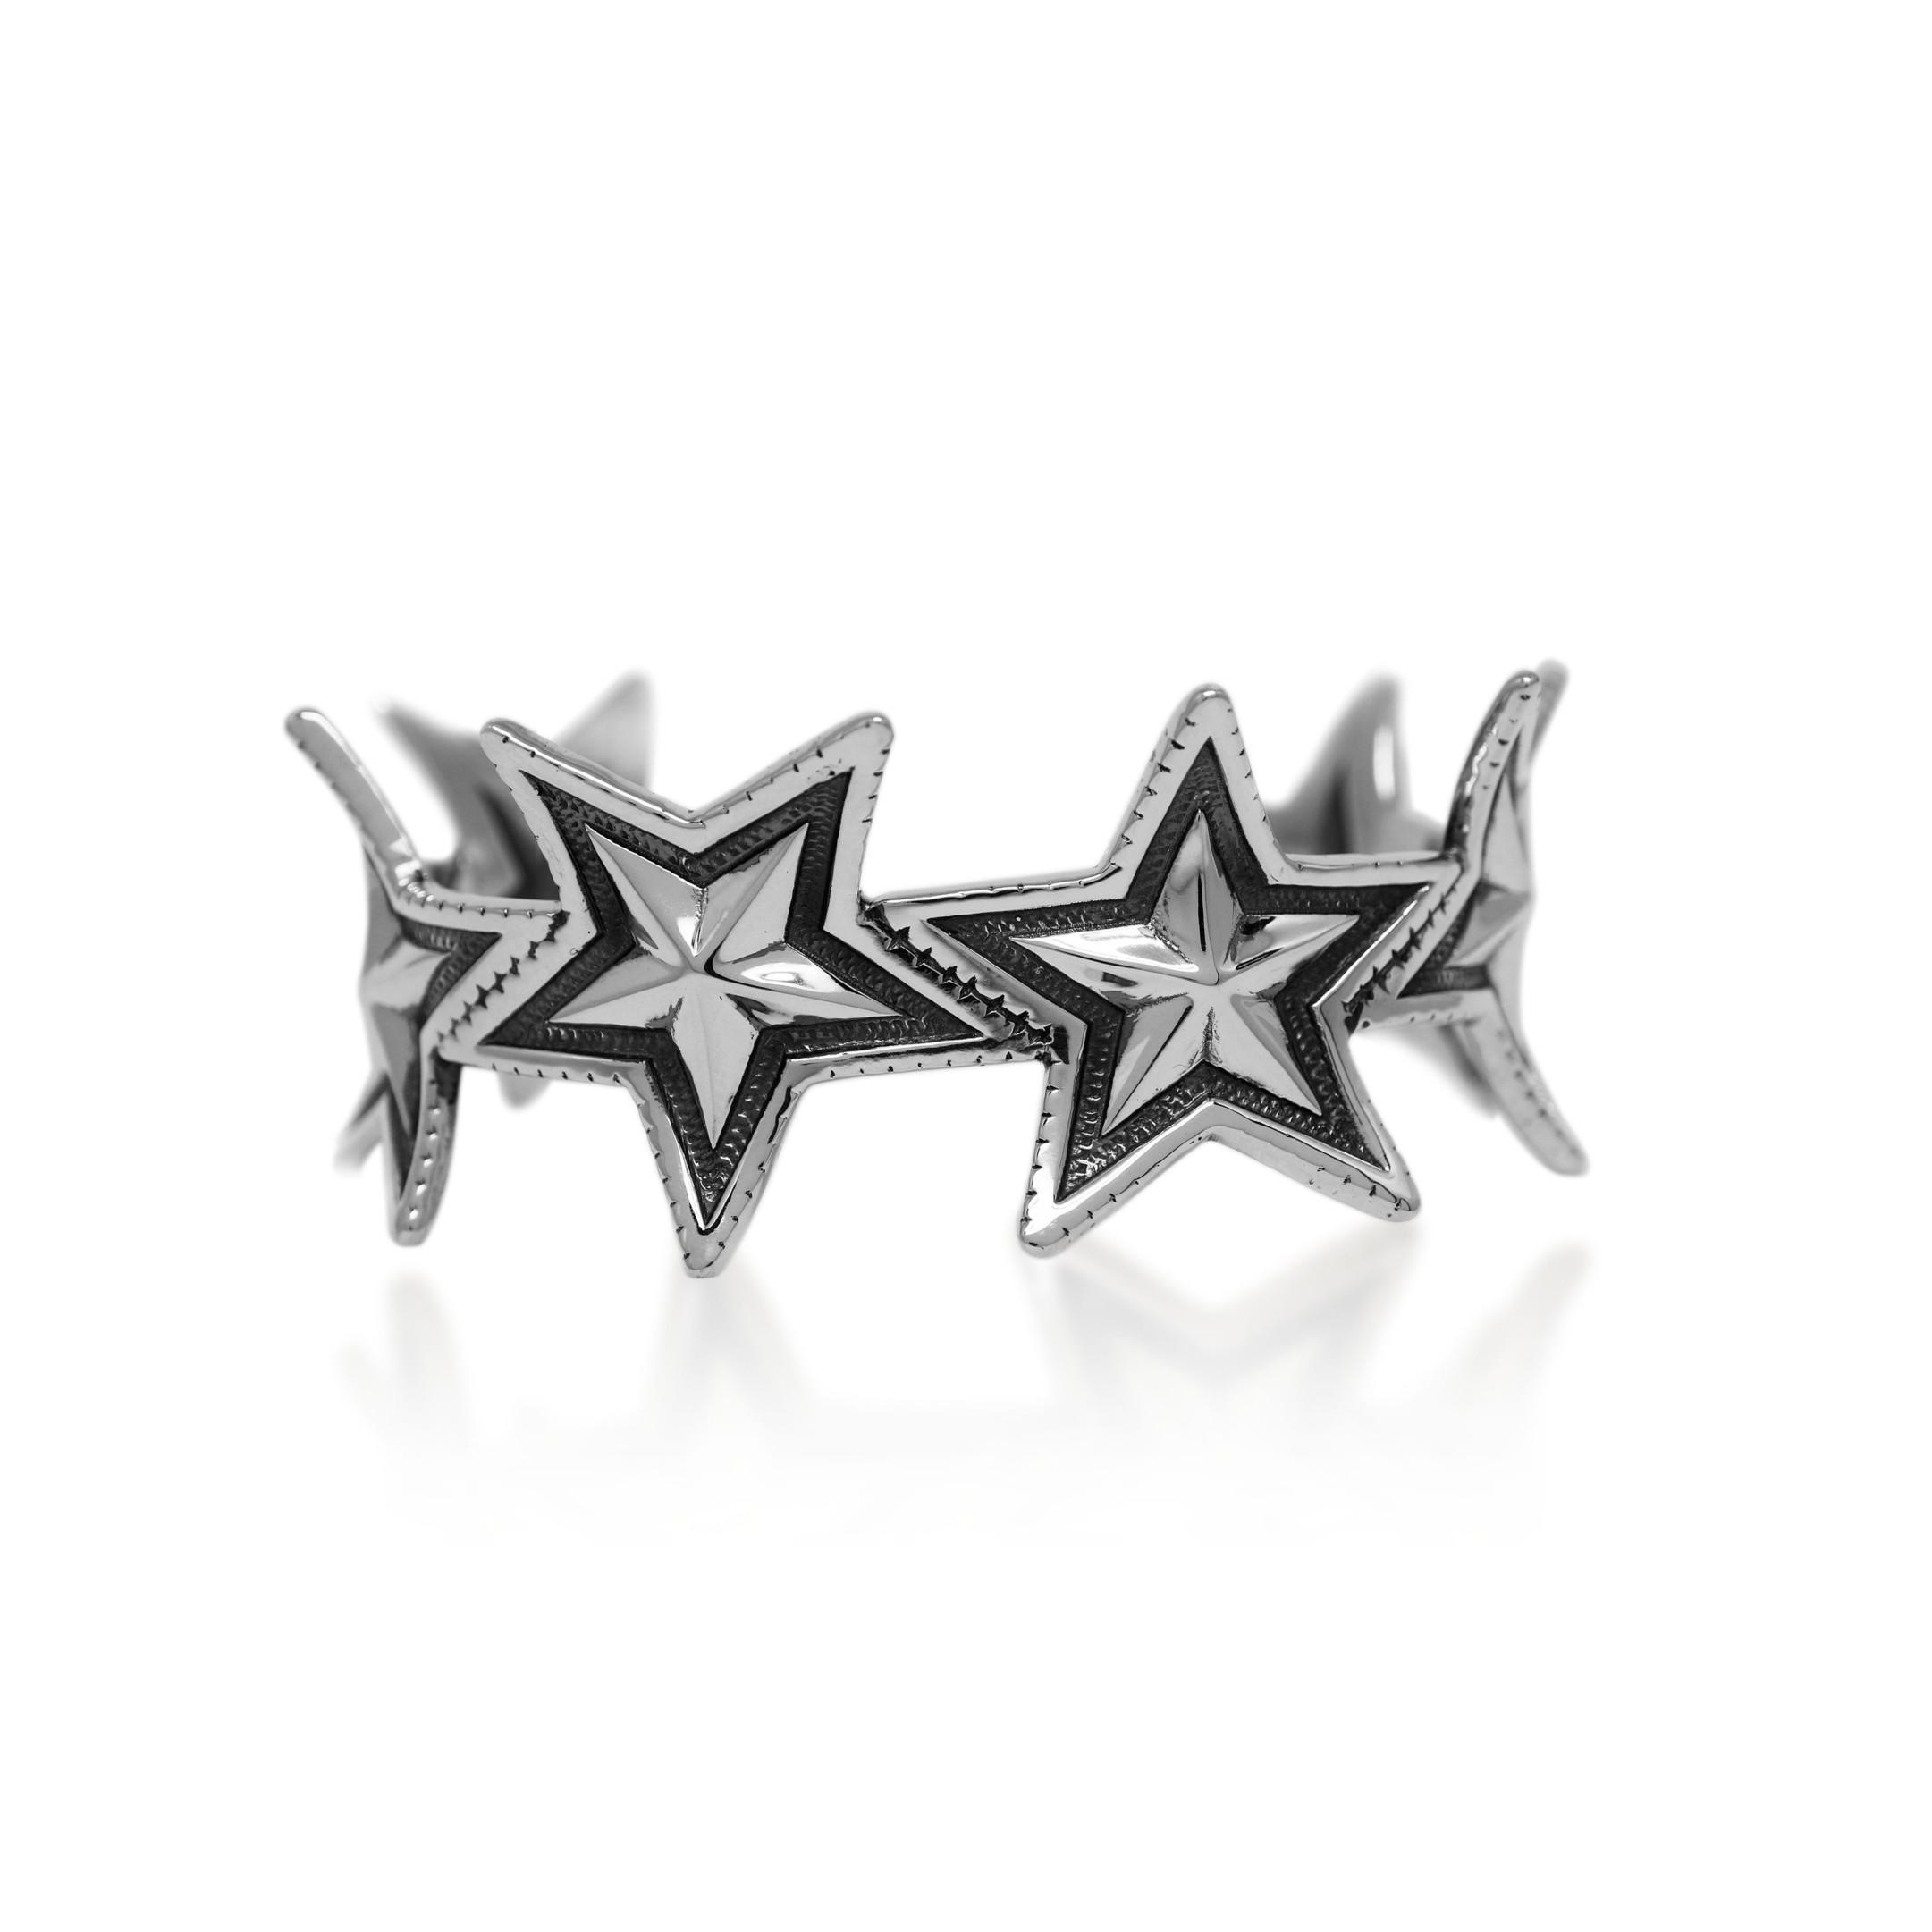 6 STAR BEND CUFF  [USD $1650]